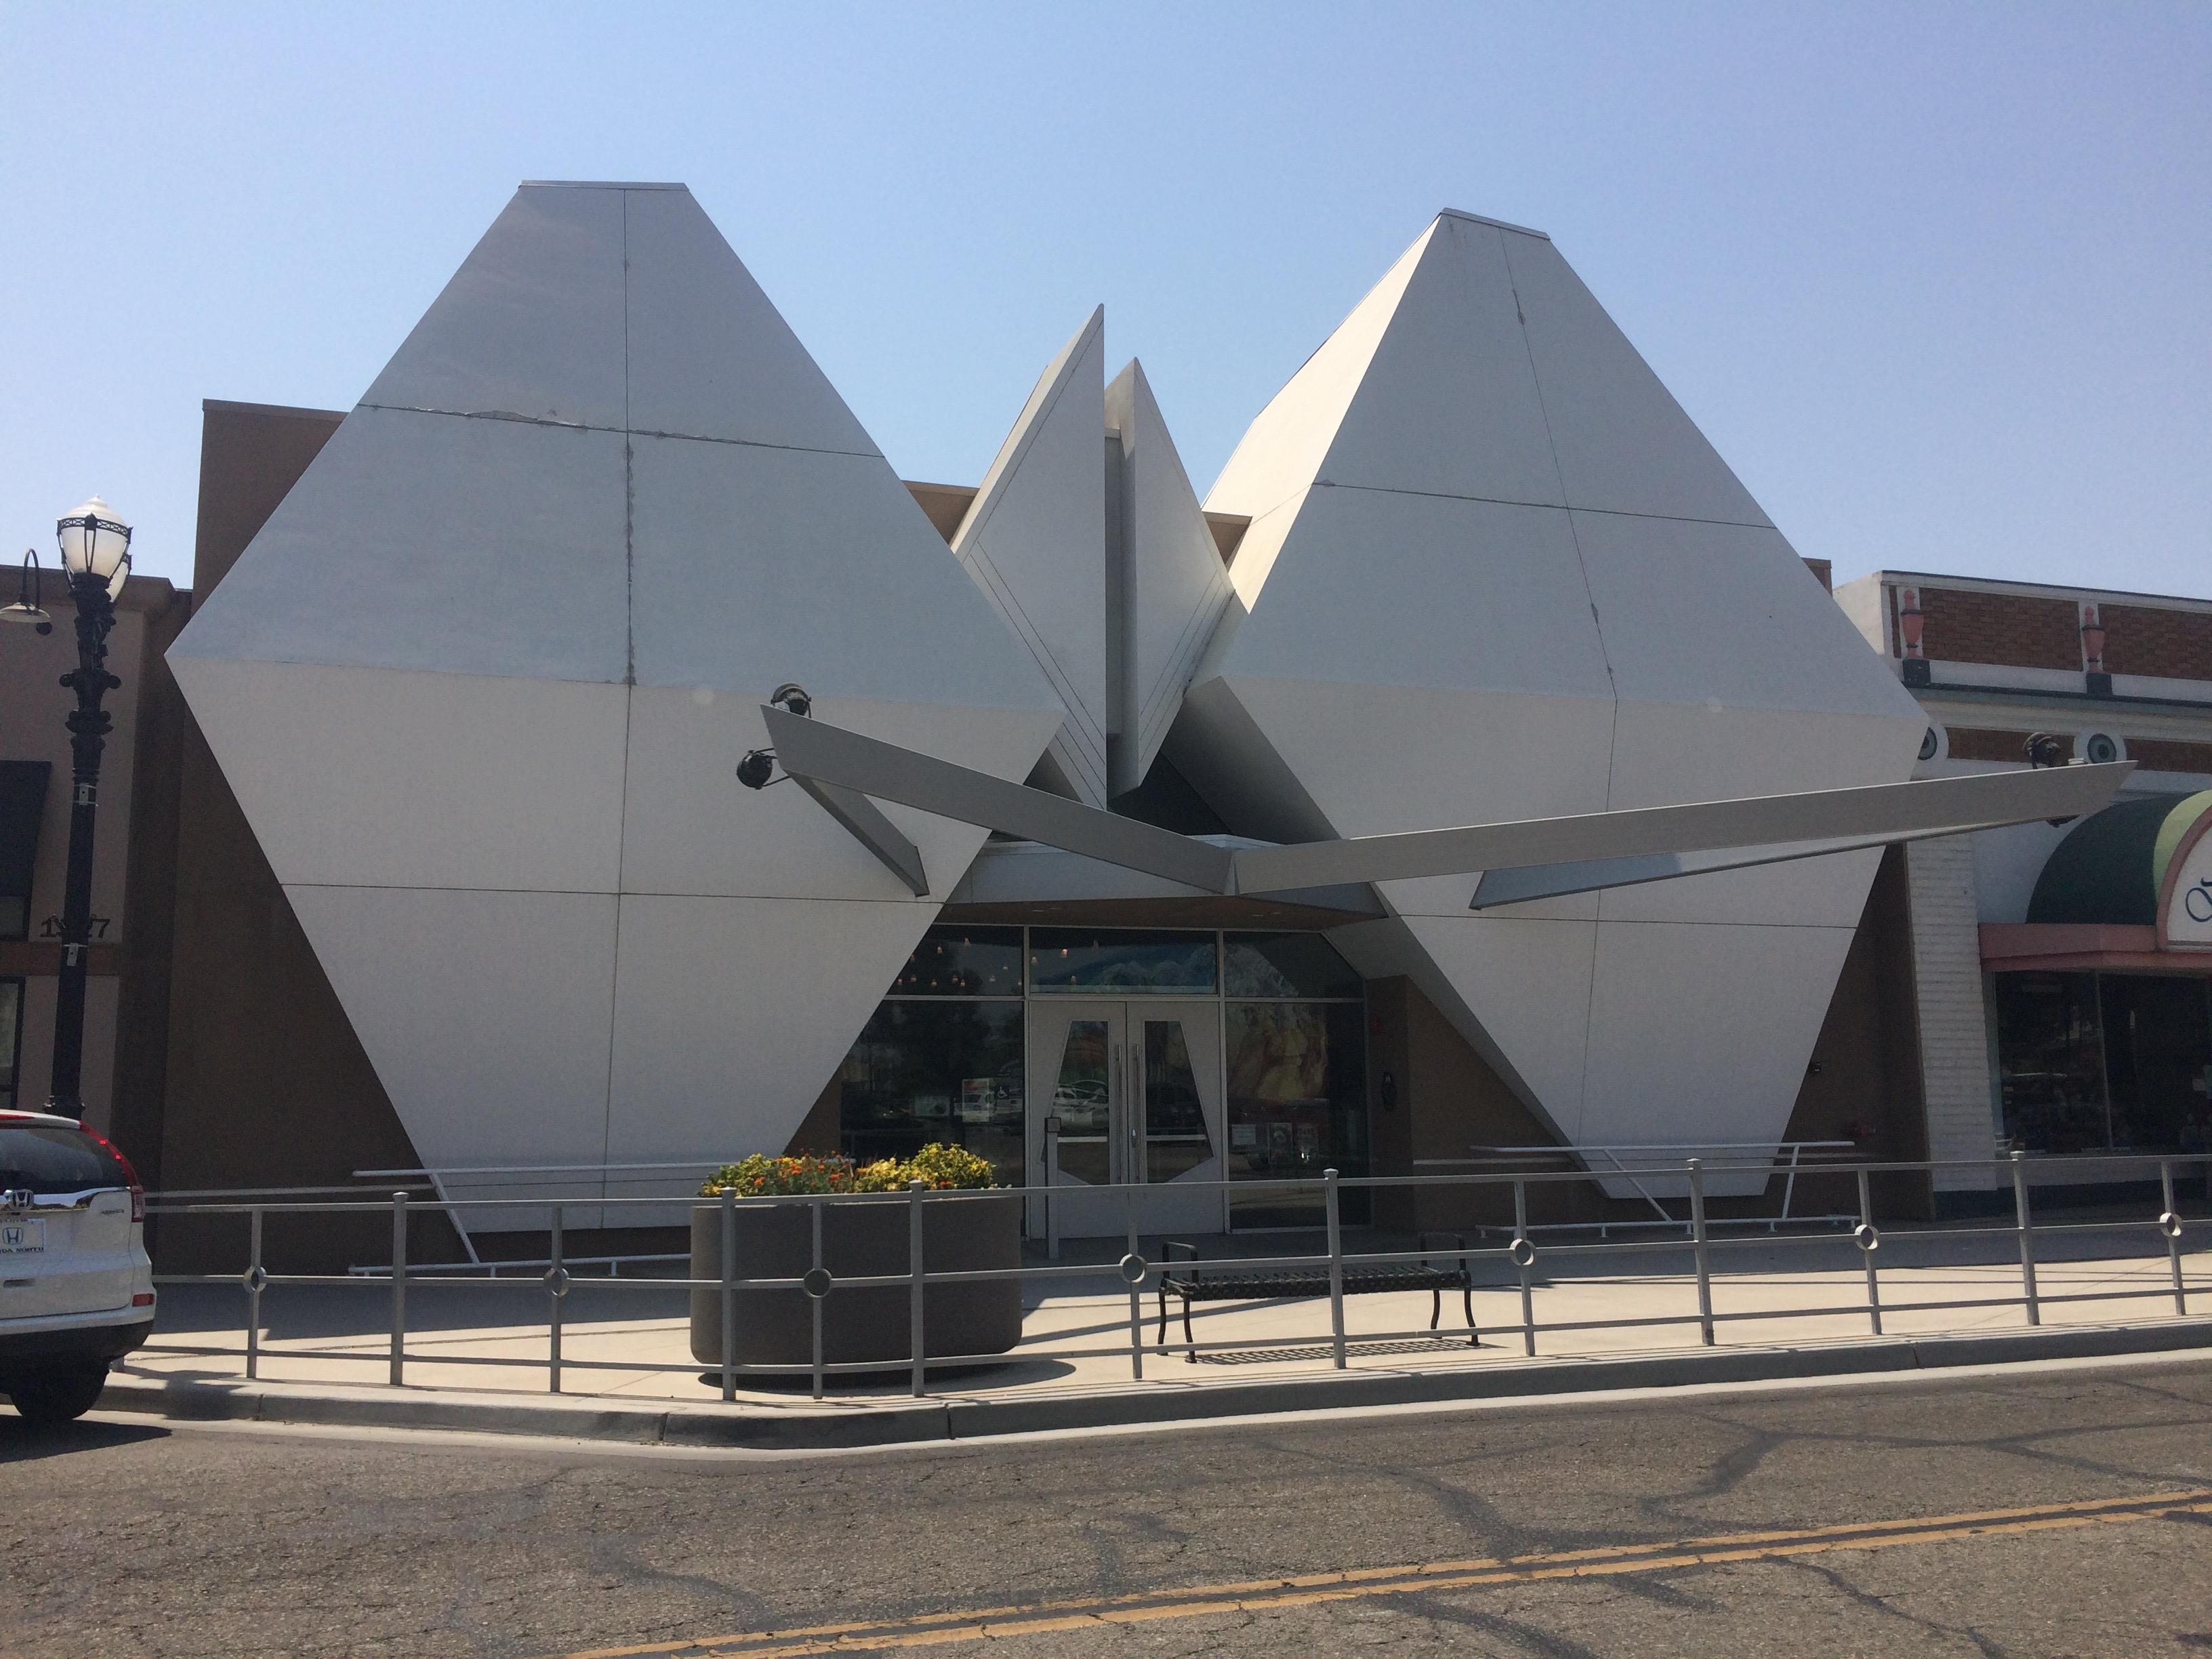 The Selma Arts Center